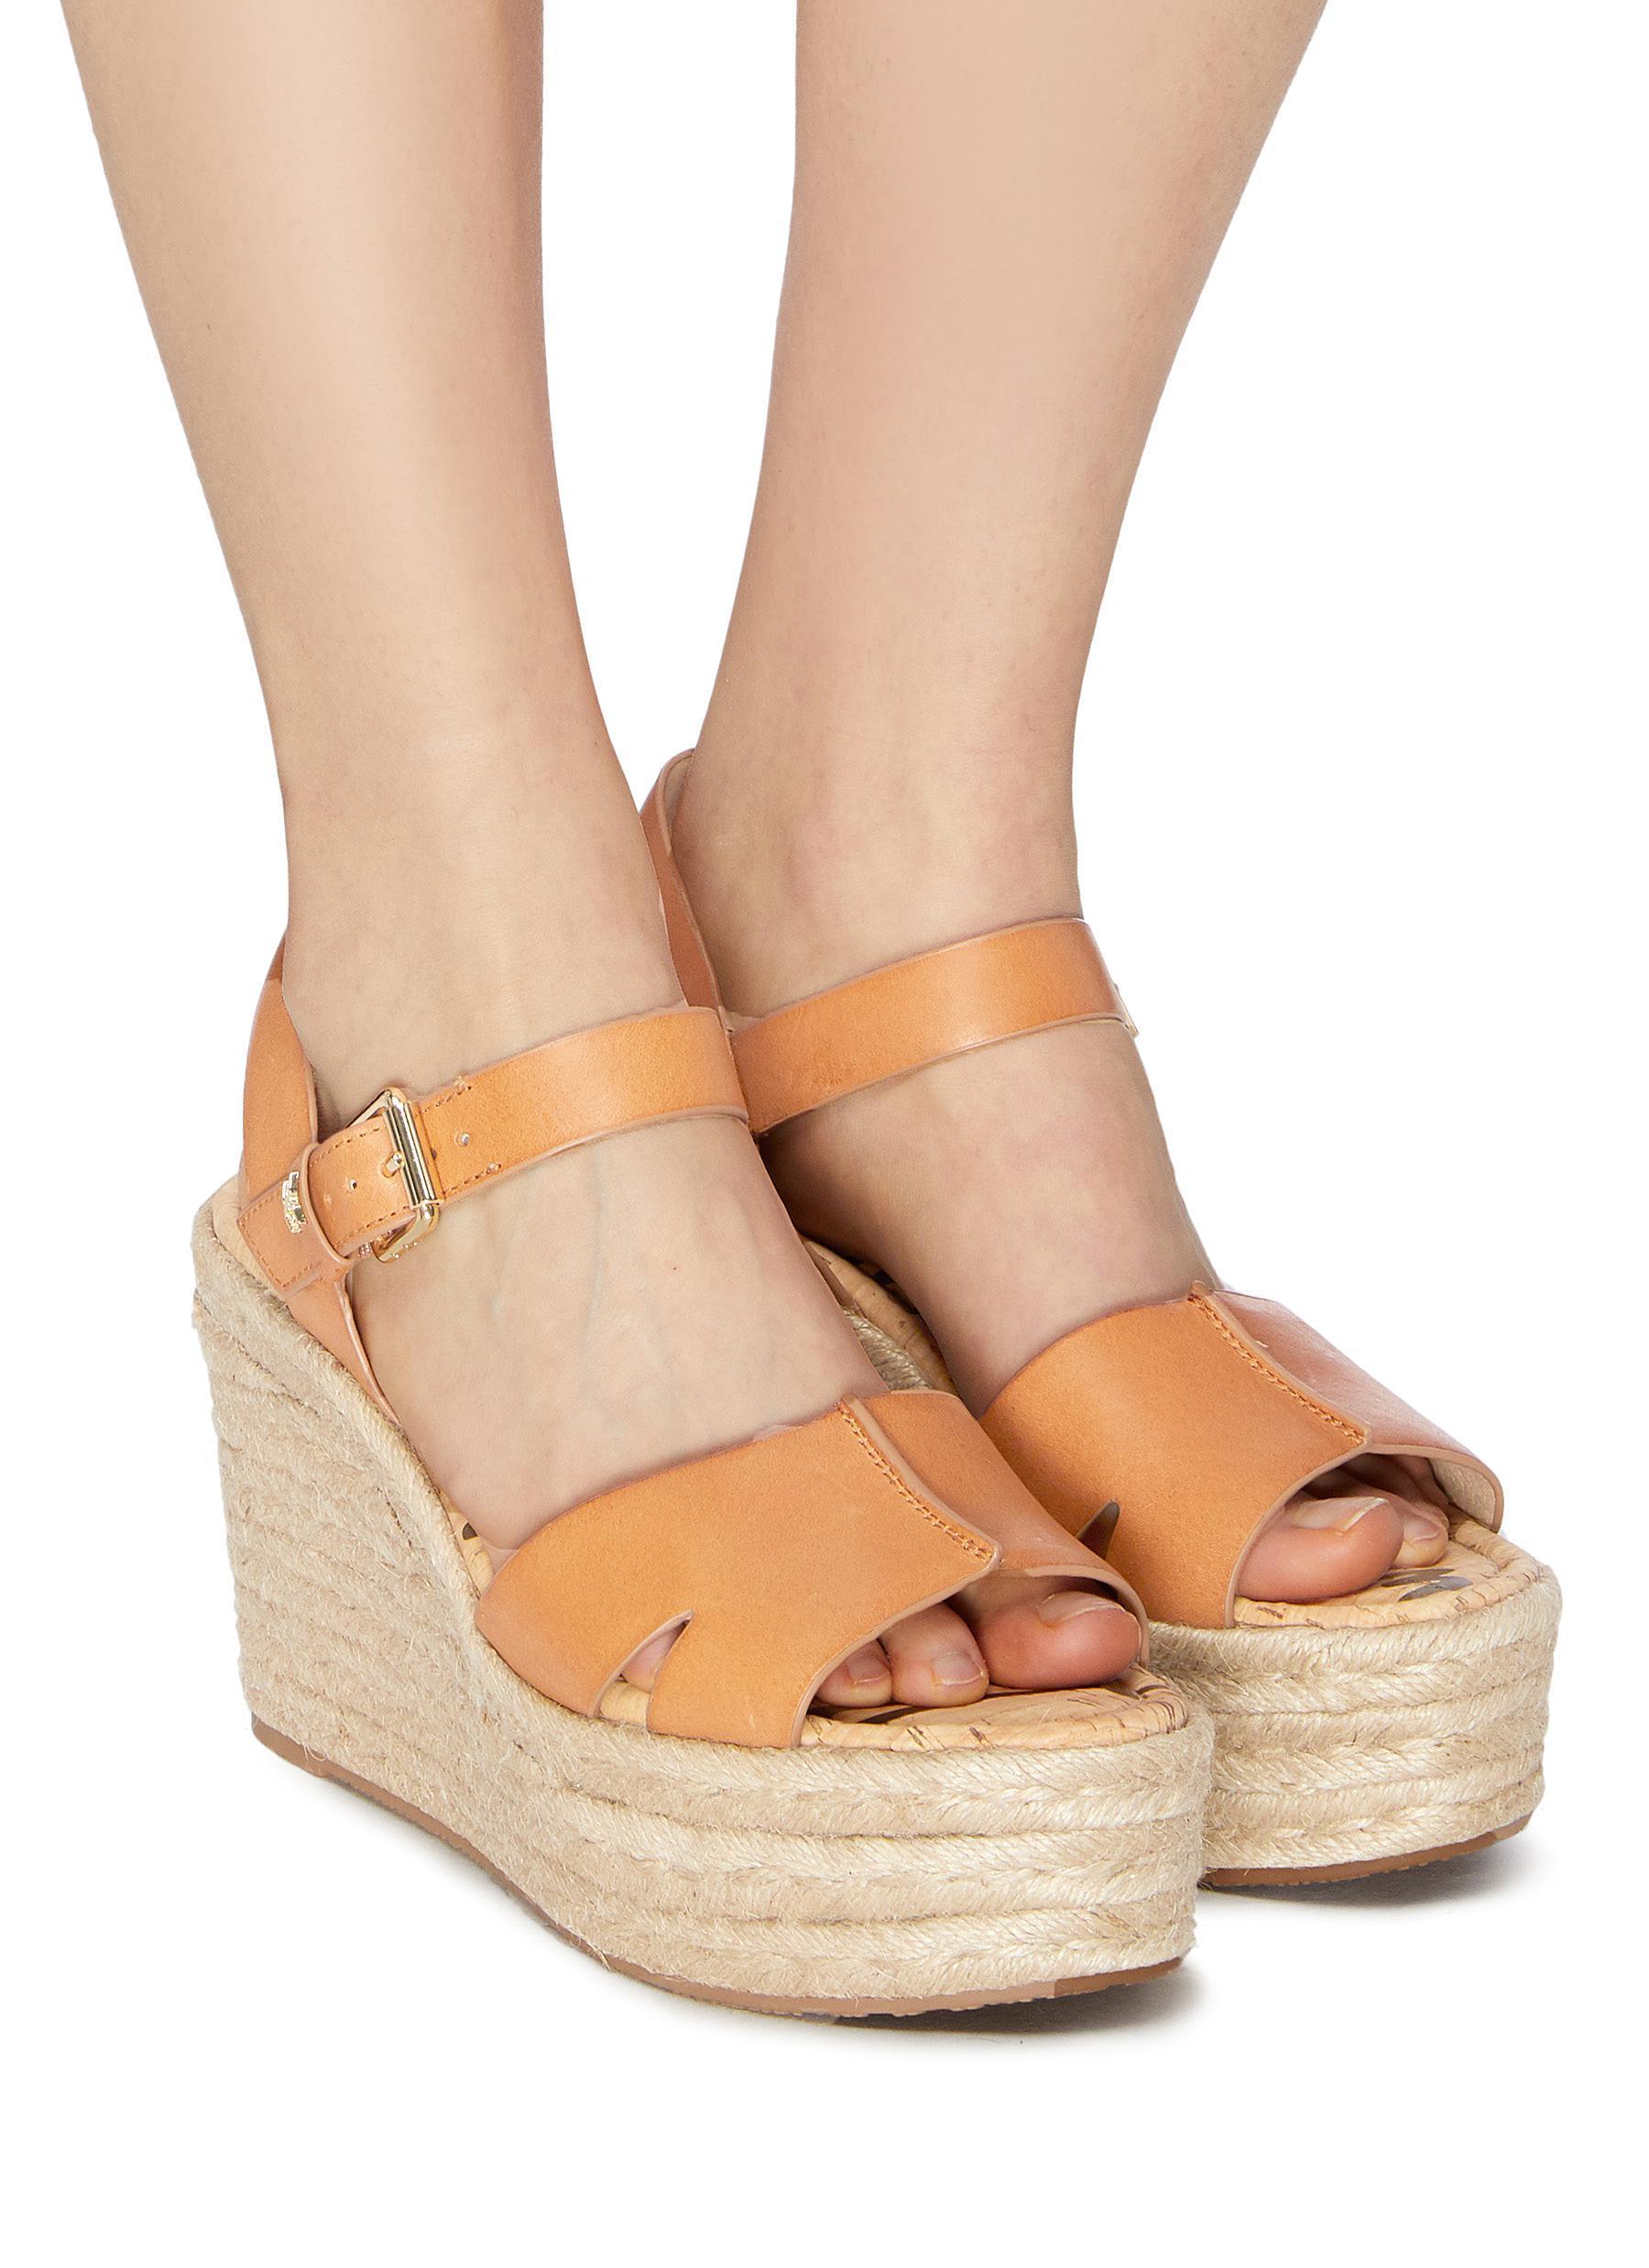 f7627a8b3ab2 Sam Edelman - Multicolor  maura  Leather Espadrille Wedge Sandals for Men -  Lyst. View fullscreen